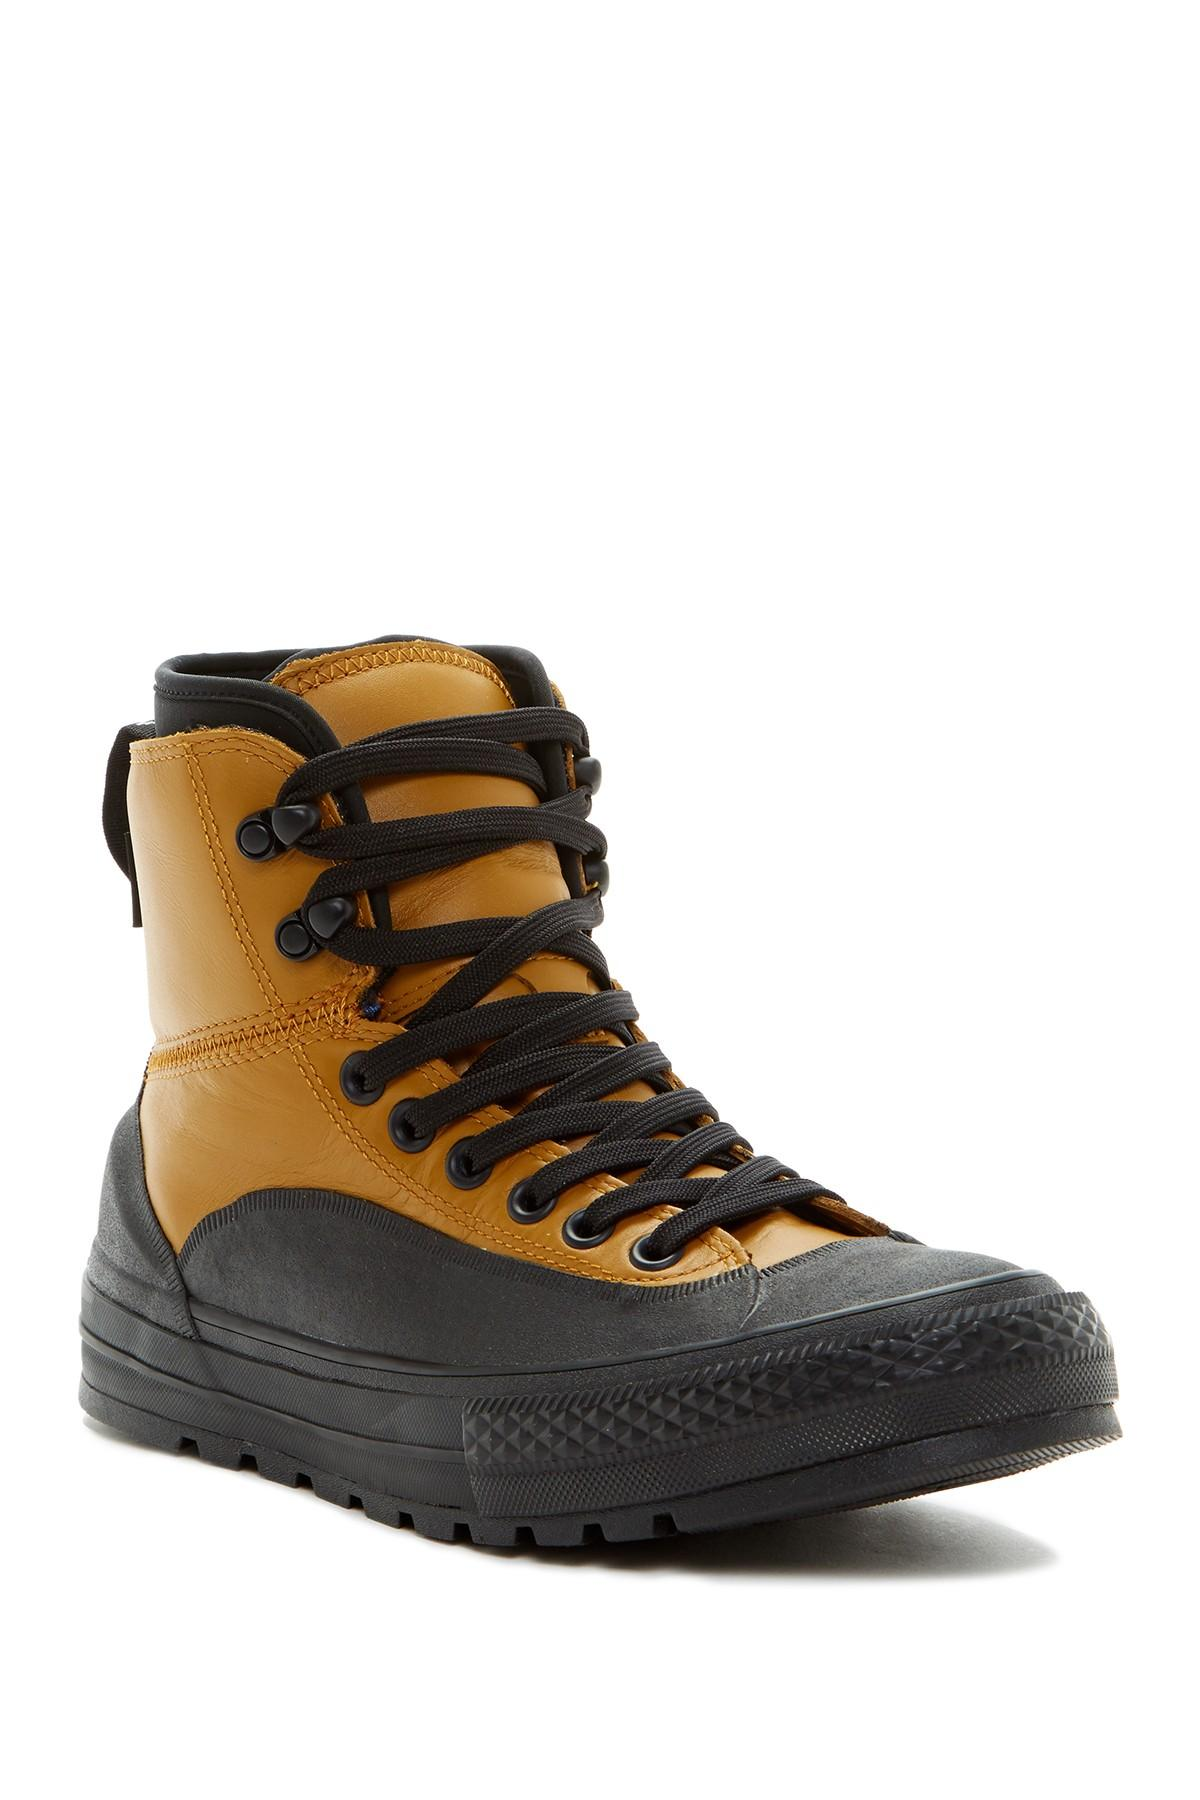 e4ef8d9a9ee9ed Lyst - Converse Chuck Taylor All Star Tekoa High Top Boot (unisex ...